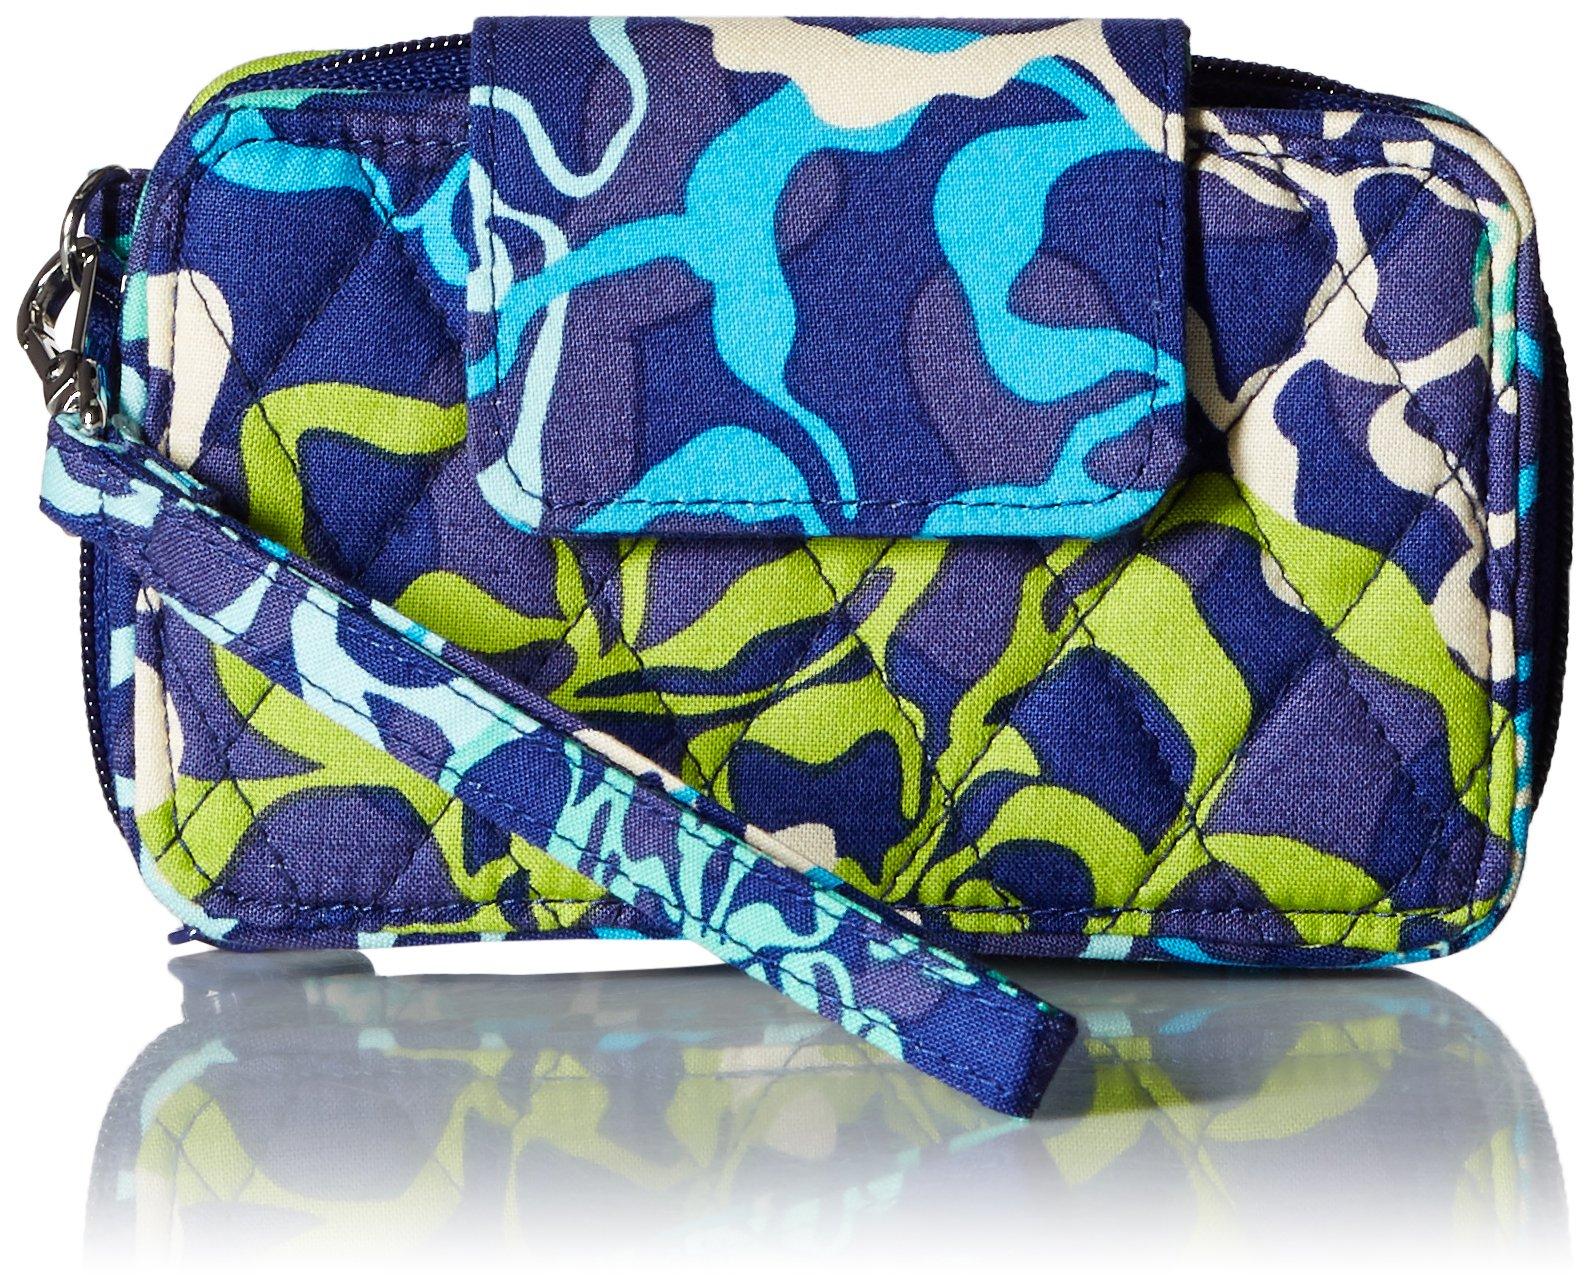 Vera Bradley Smartphone Wristlet 2.0 Wallet, Katalina Blues, One Size